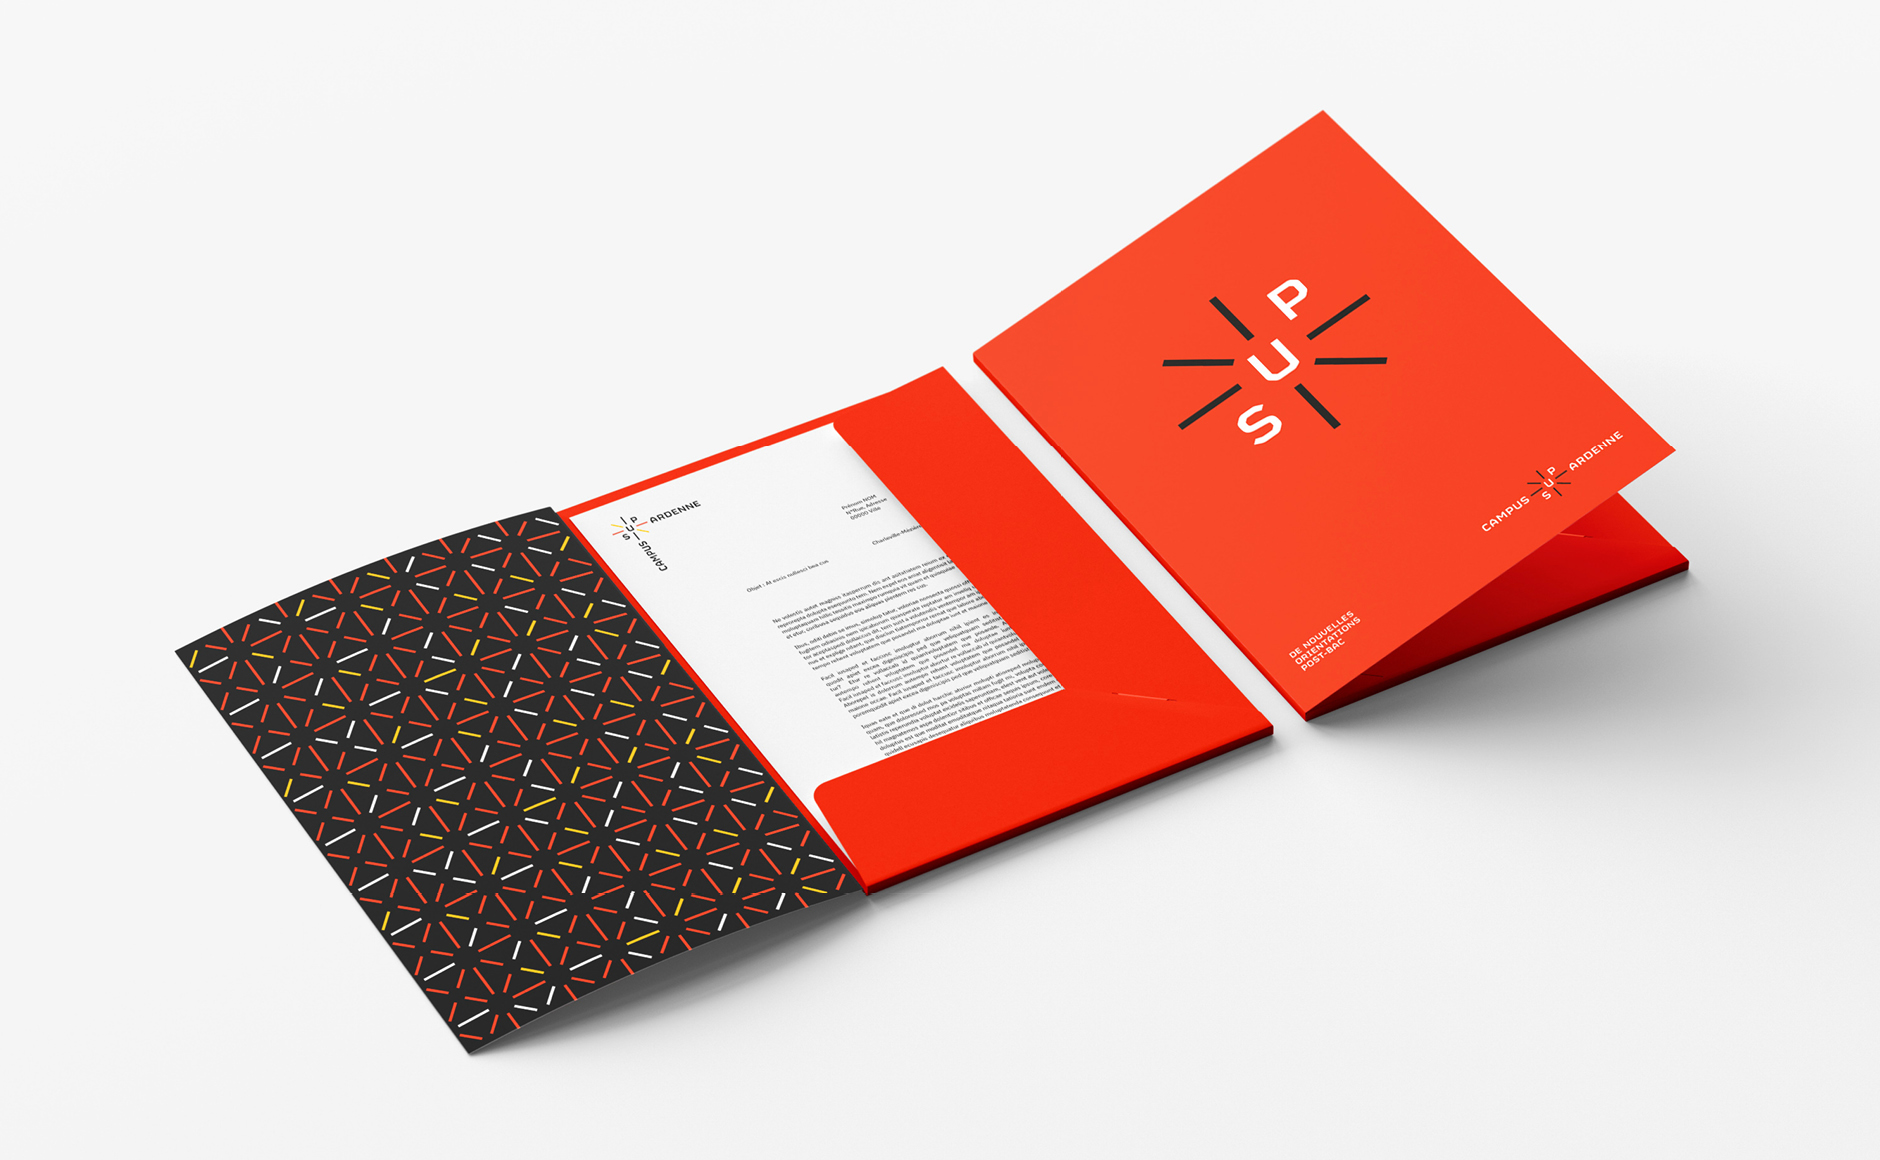 pochette A4 branding